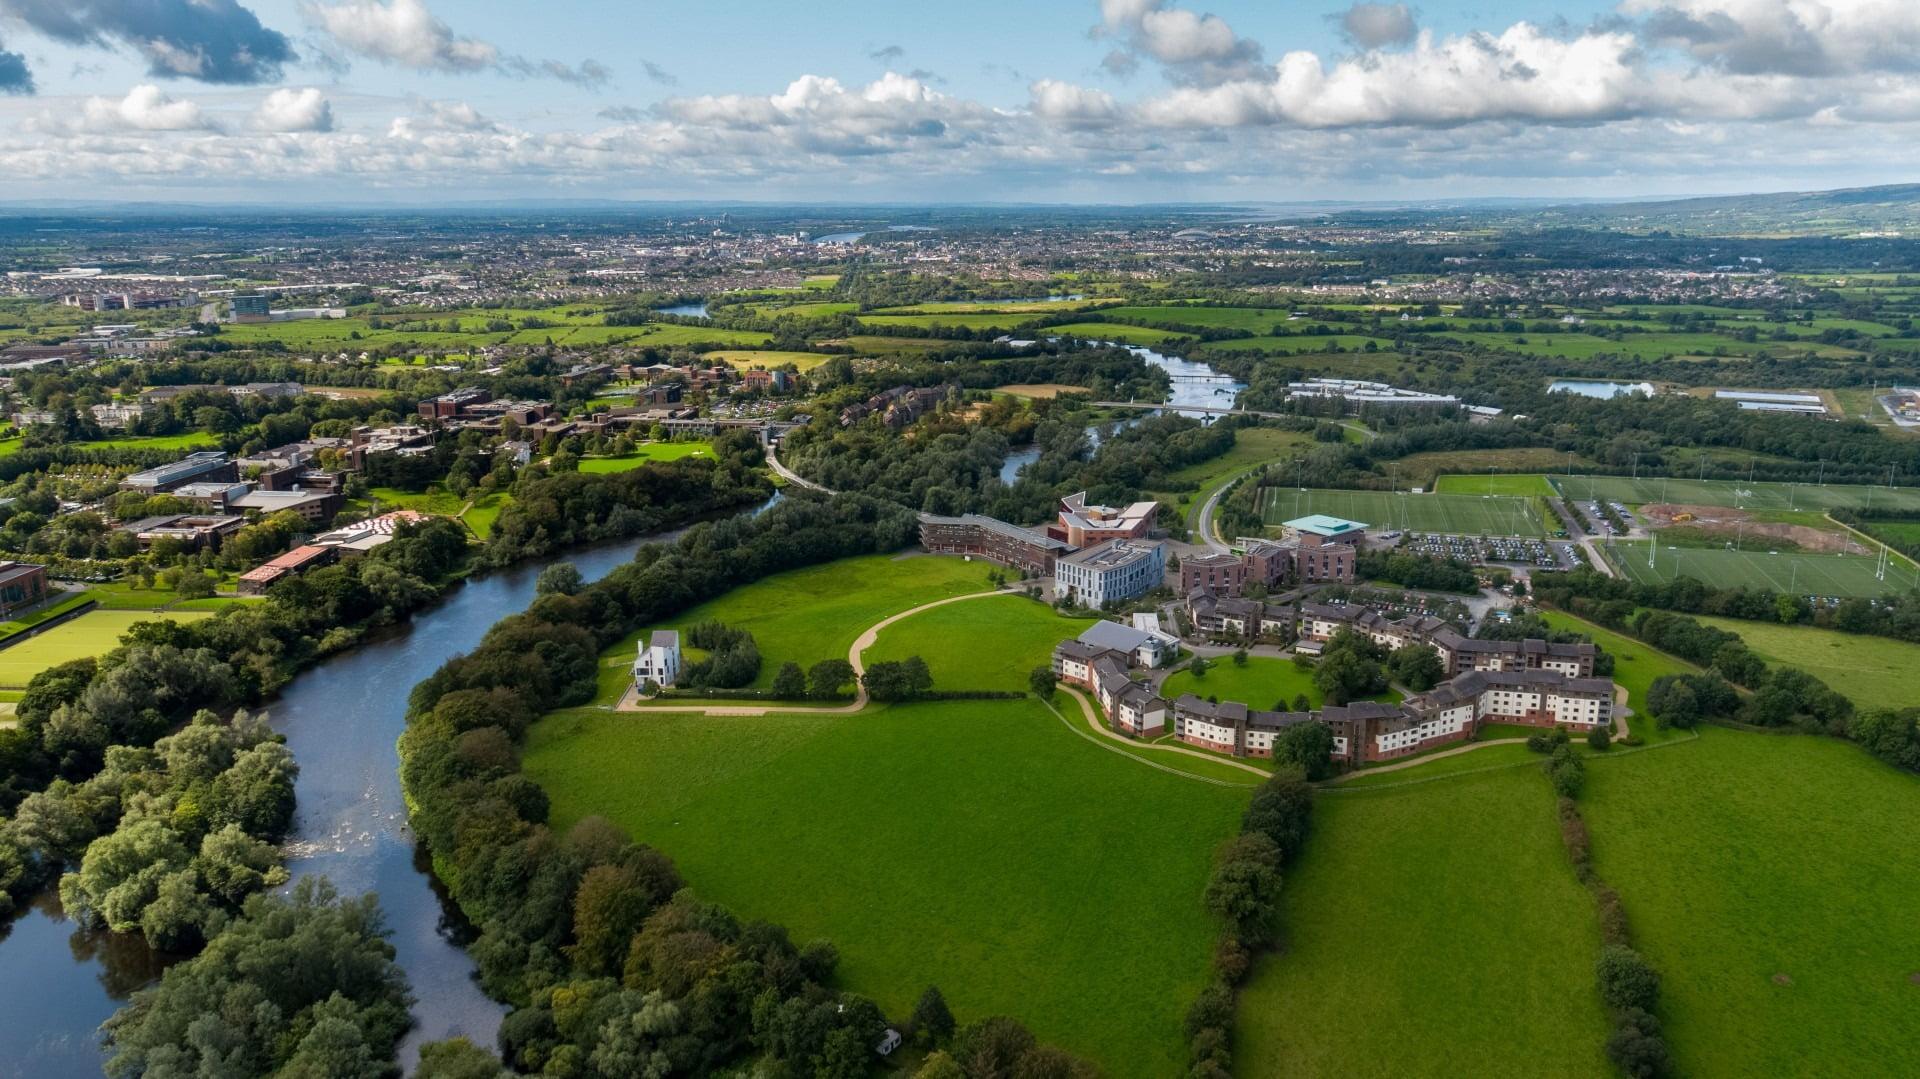 Water resources, Natural landscape, Urban design, Land lot, Cloud, Sky, Plant, Tree, Highland